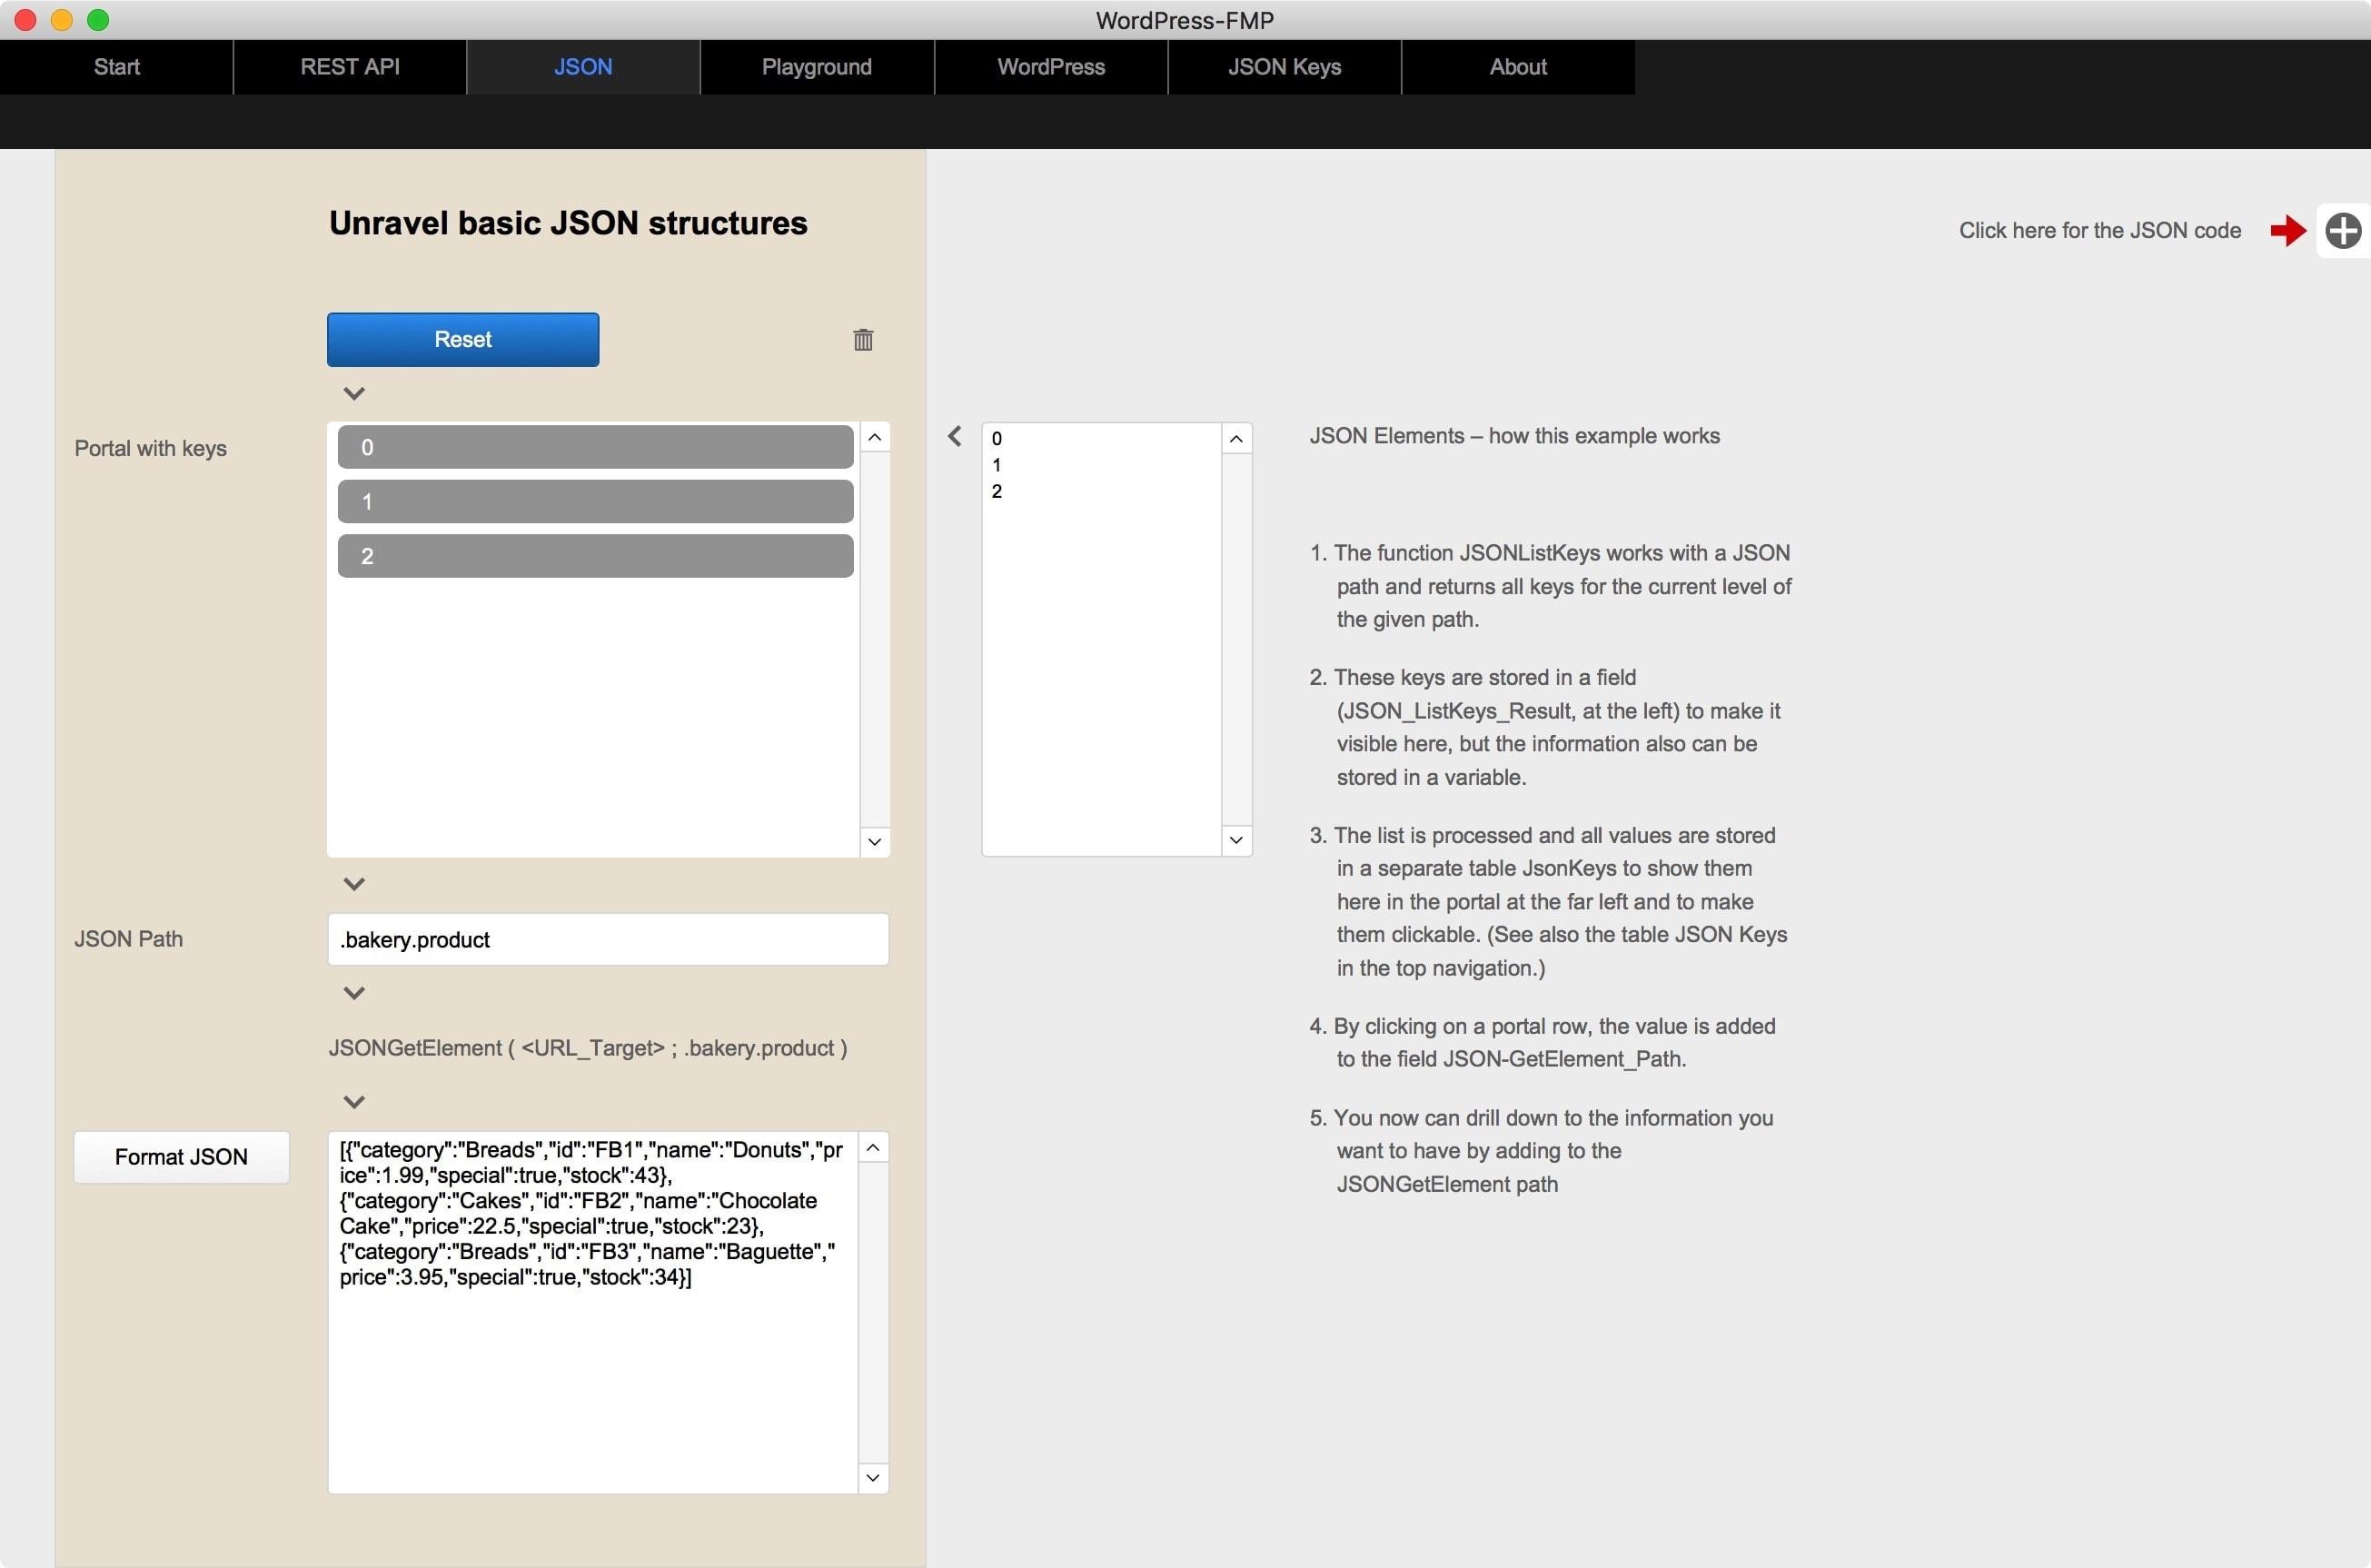 Filemaker Resources Archive - FM Starter